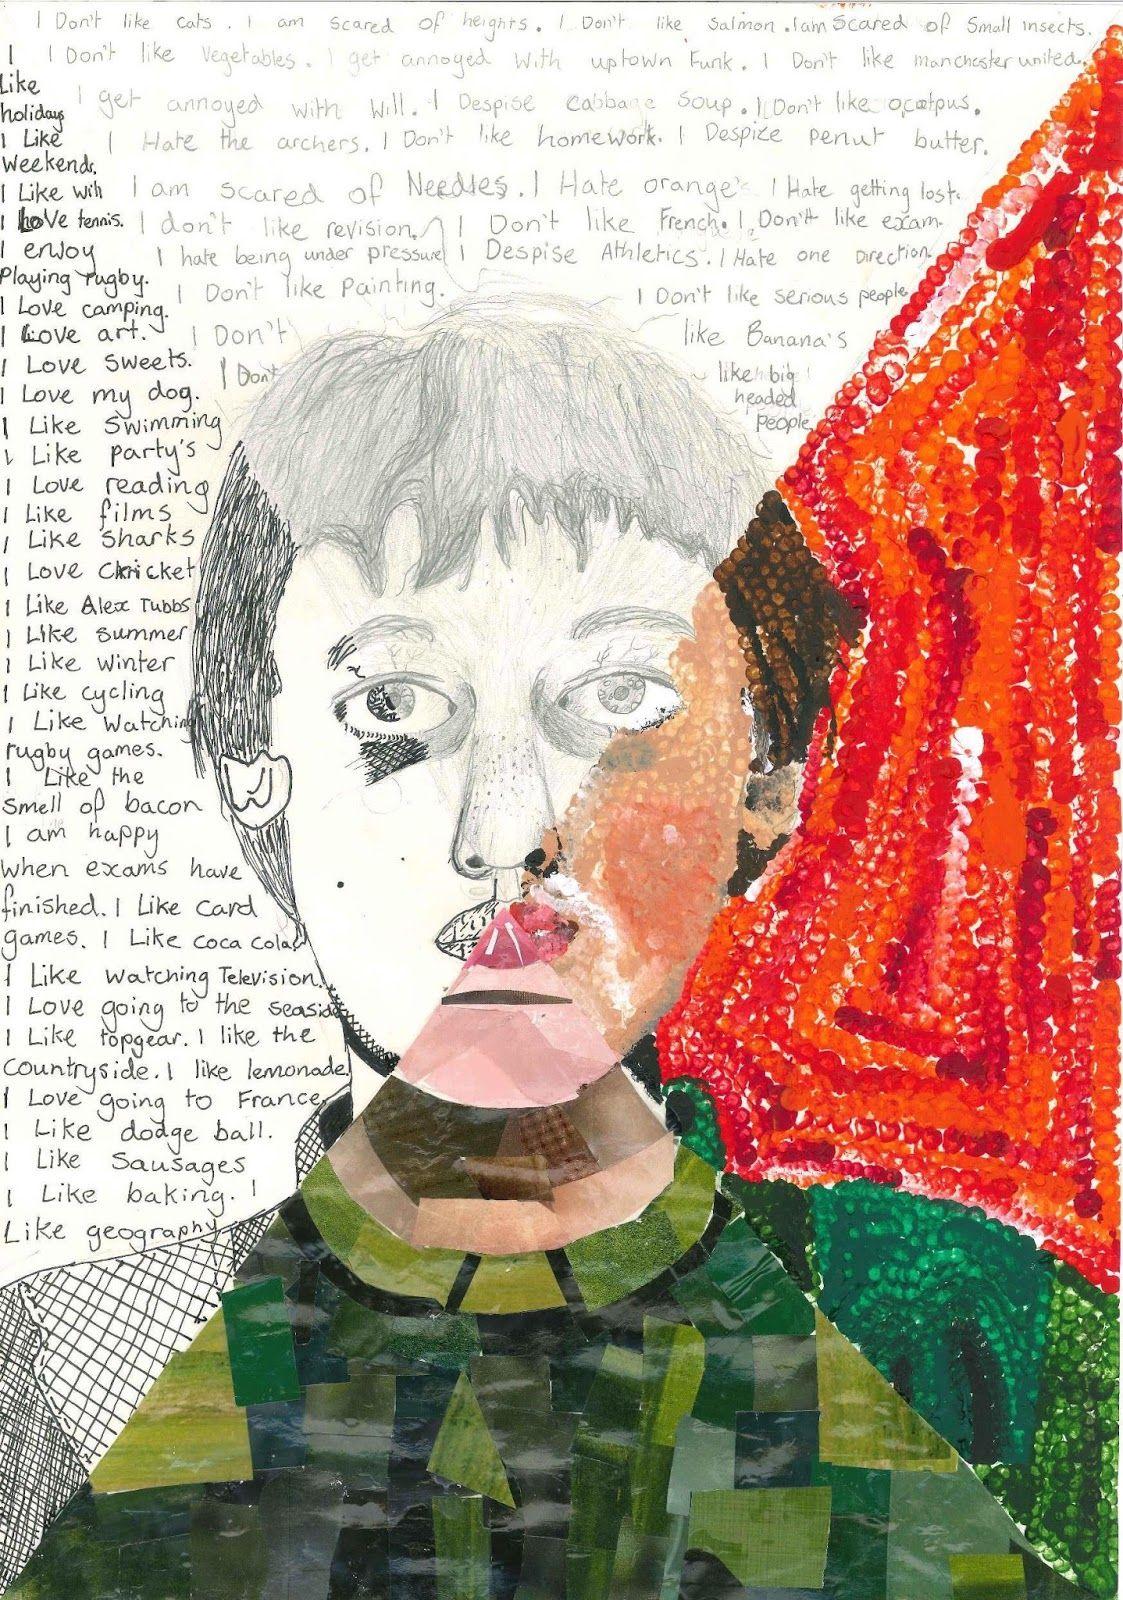 Year 7 Student Mixed Media Self Portrait